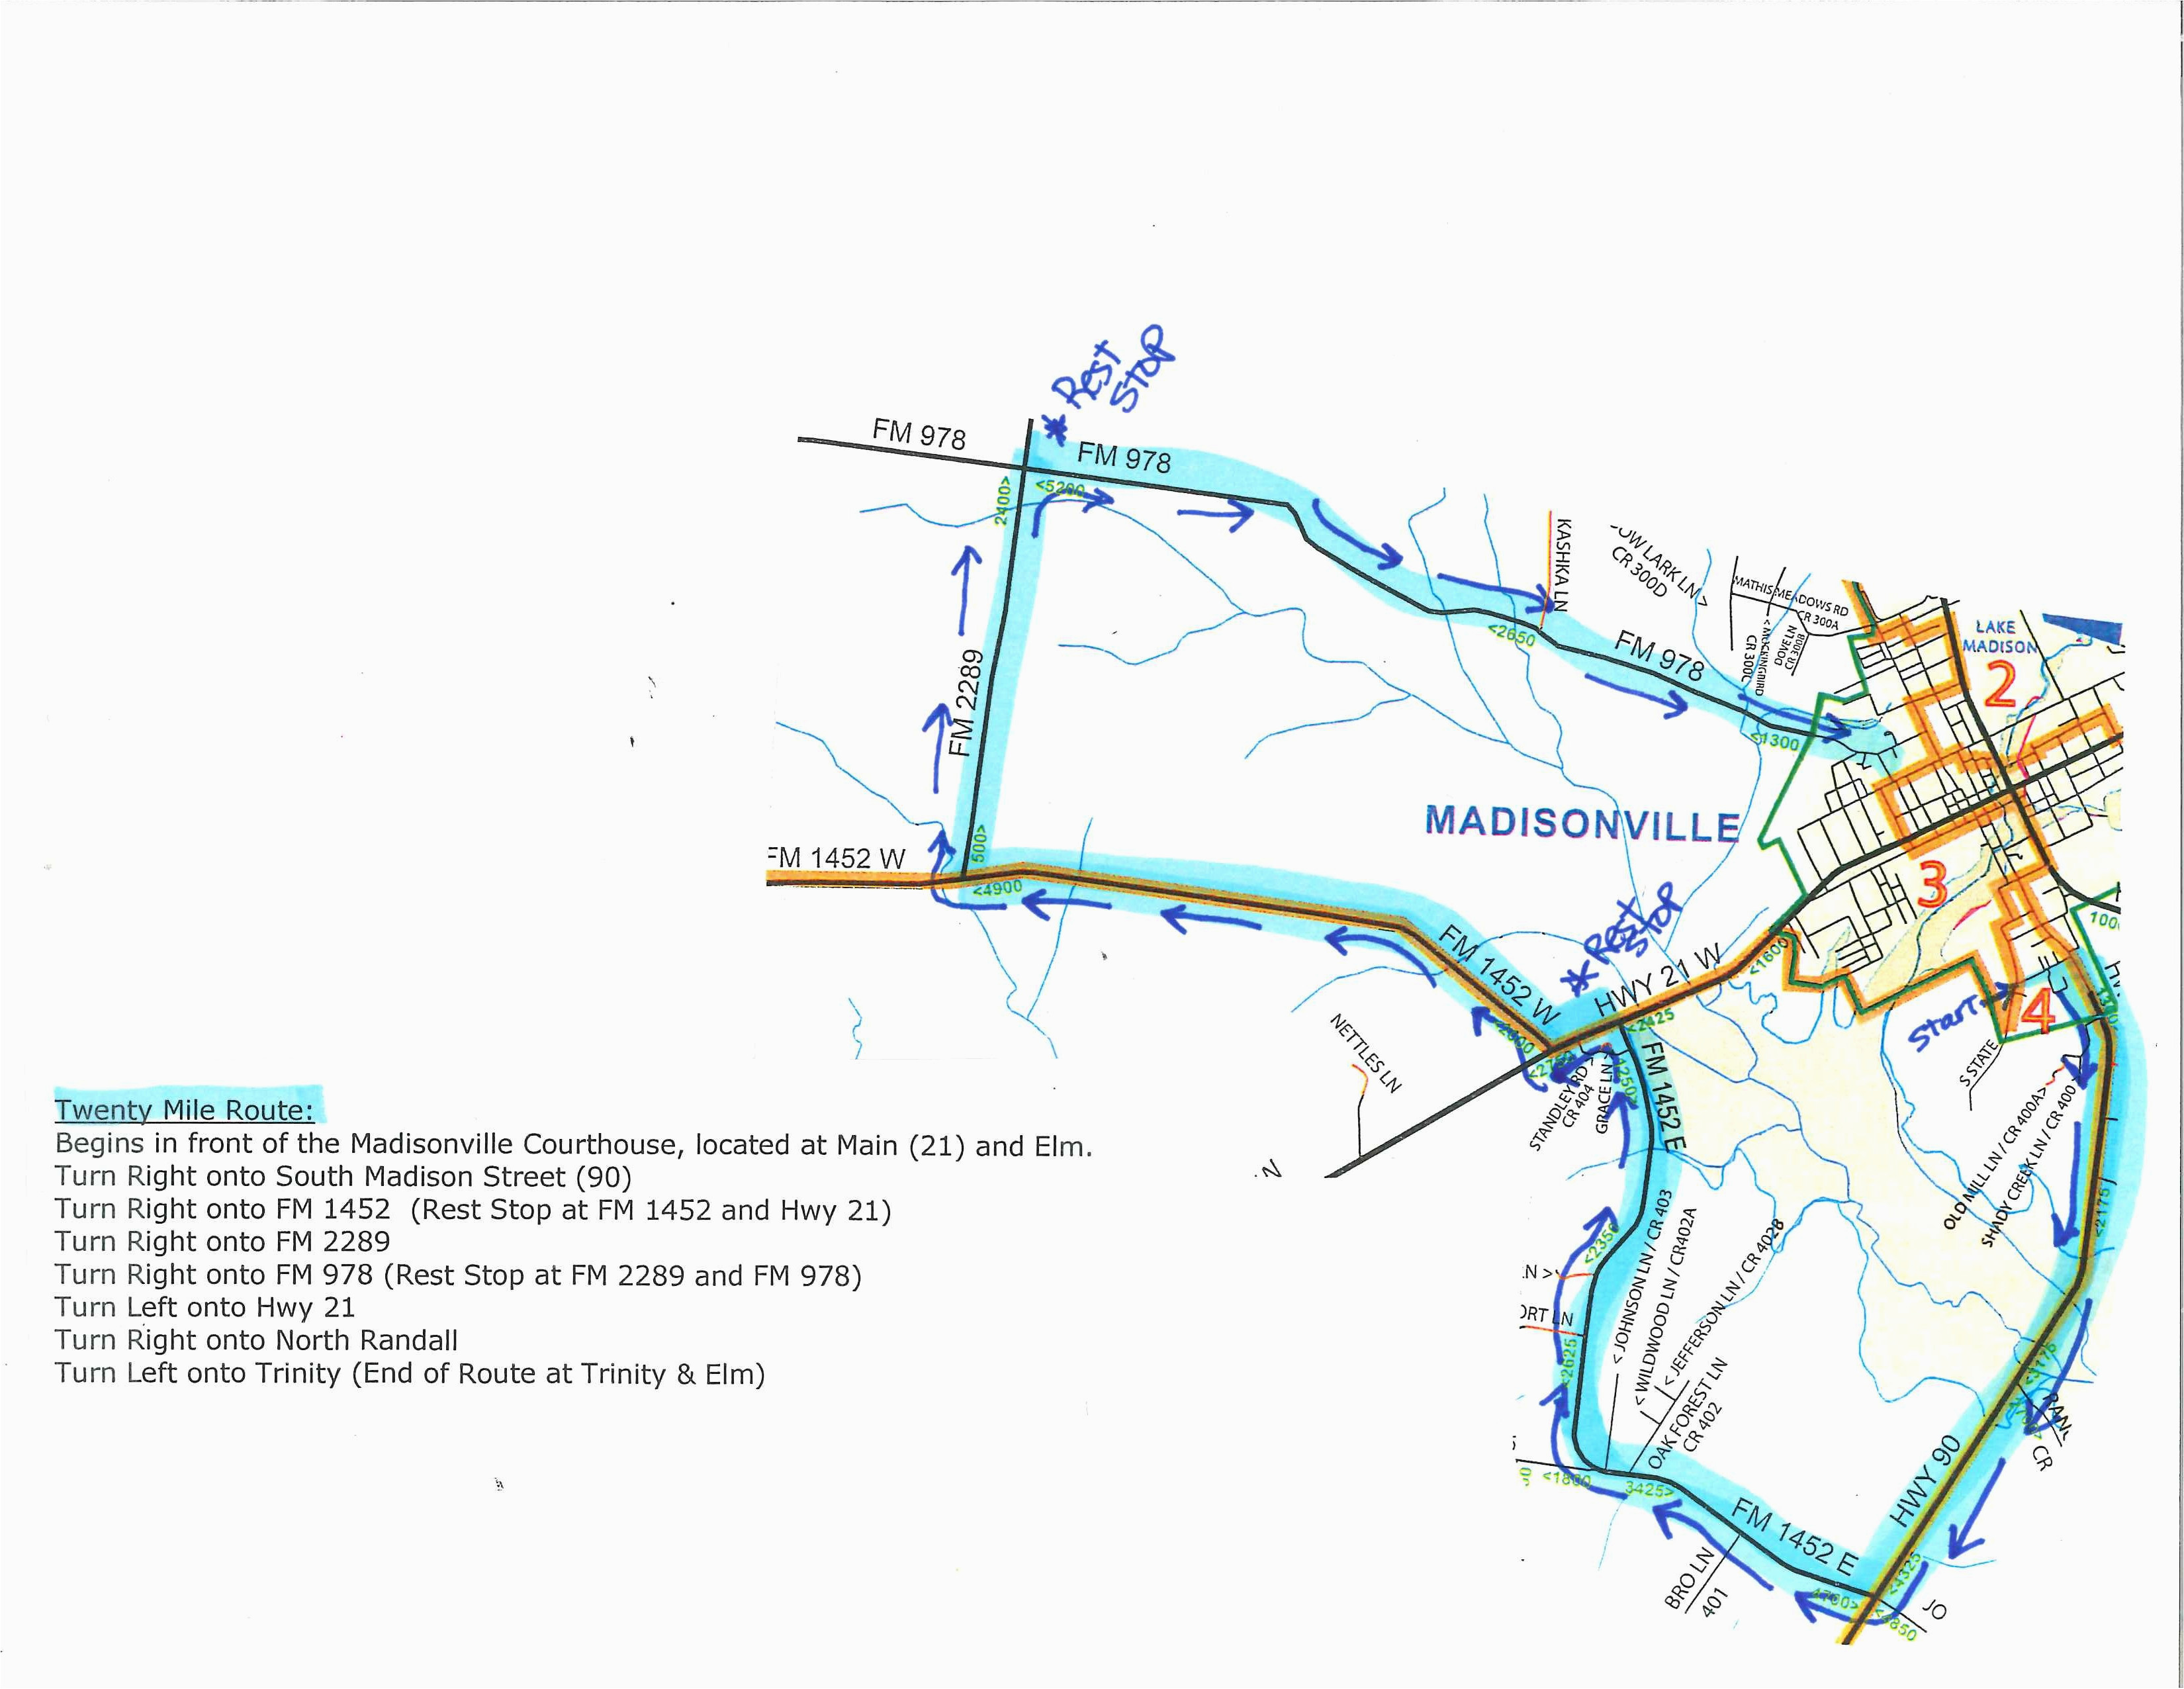 tour de madison bicycle ride festival madisonville tx 2017 active